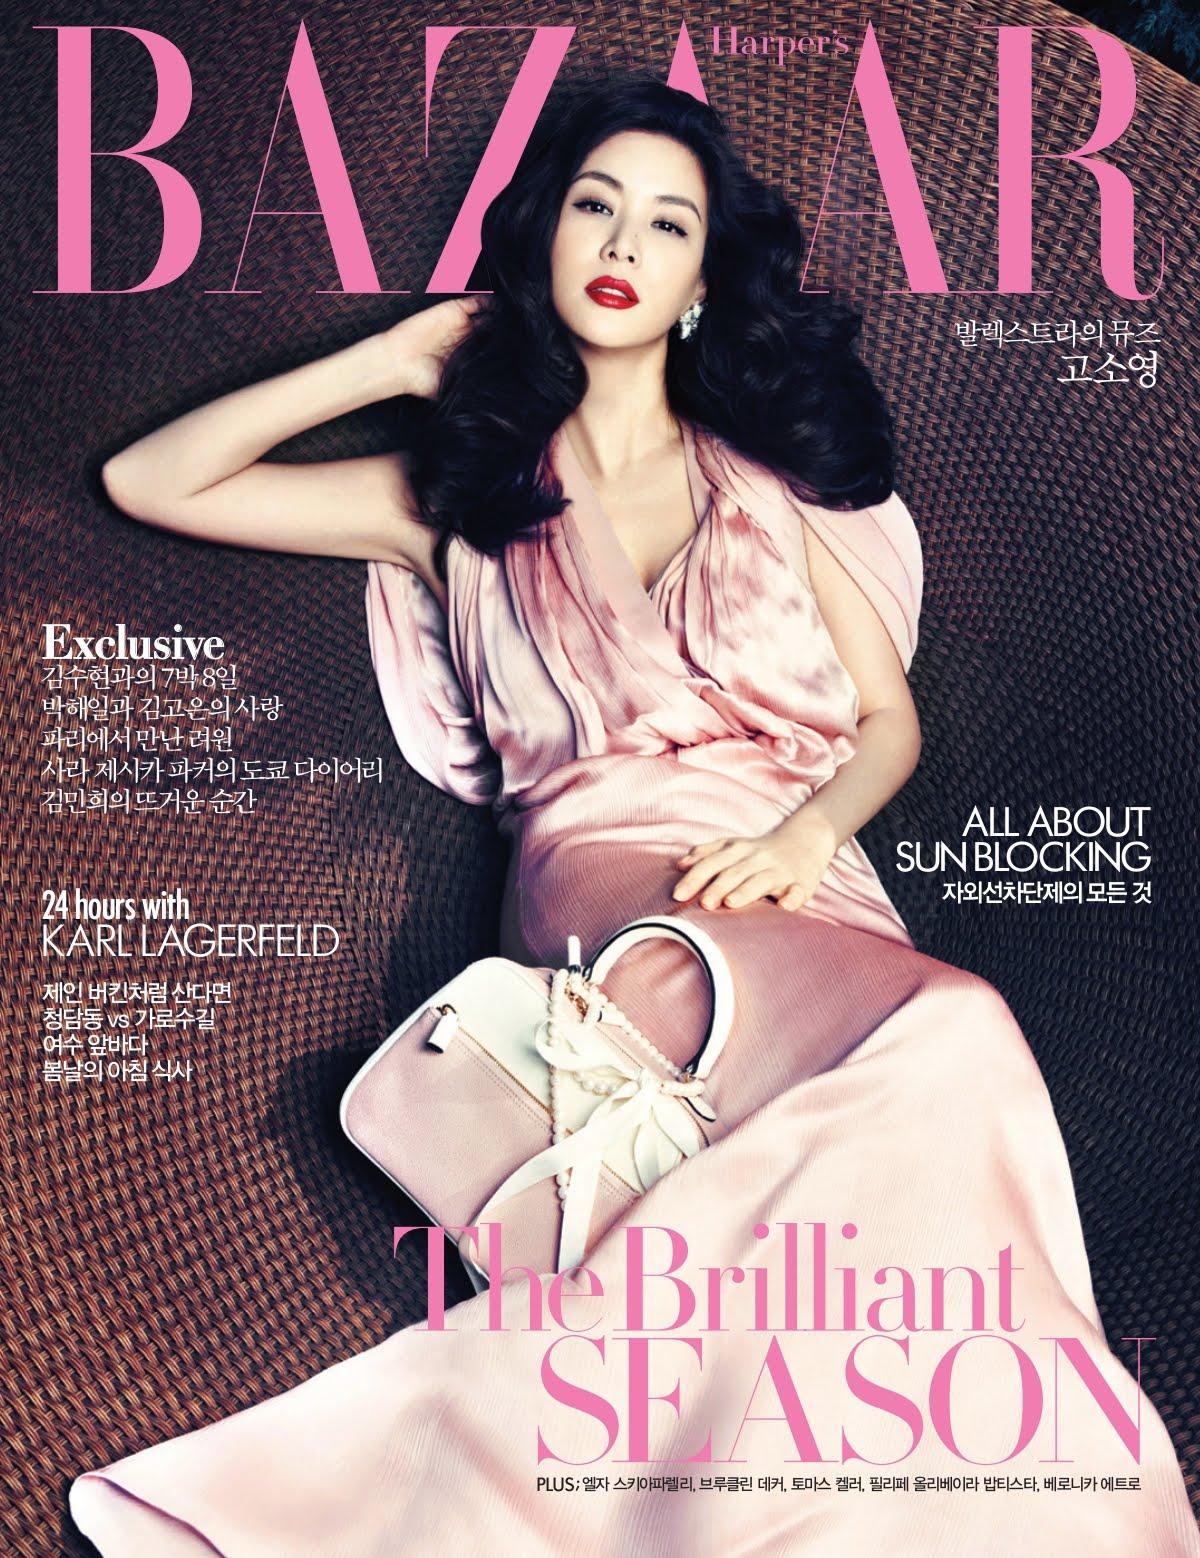 http://4.bp.blogspot.com/-idVQ8UFV8Ys/T7bf9obMZTI/AAAAAAAA7eA/GcgUqzqPPKI/s1600/Ko+So-young+by+Hong+Jang+Hyun+%28Harper%27s+Bazaar+Korea+May+2012%29.jpg